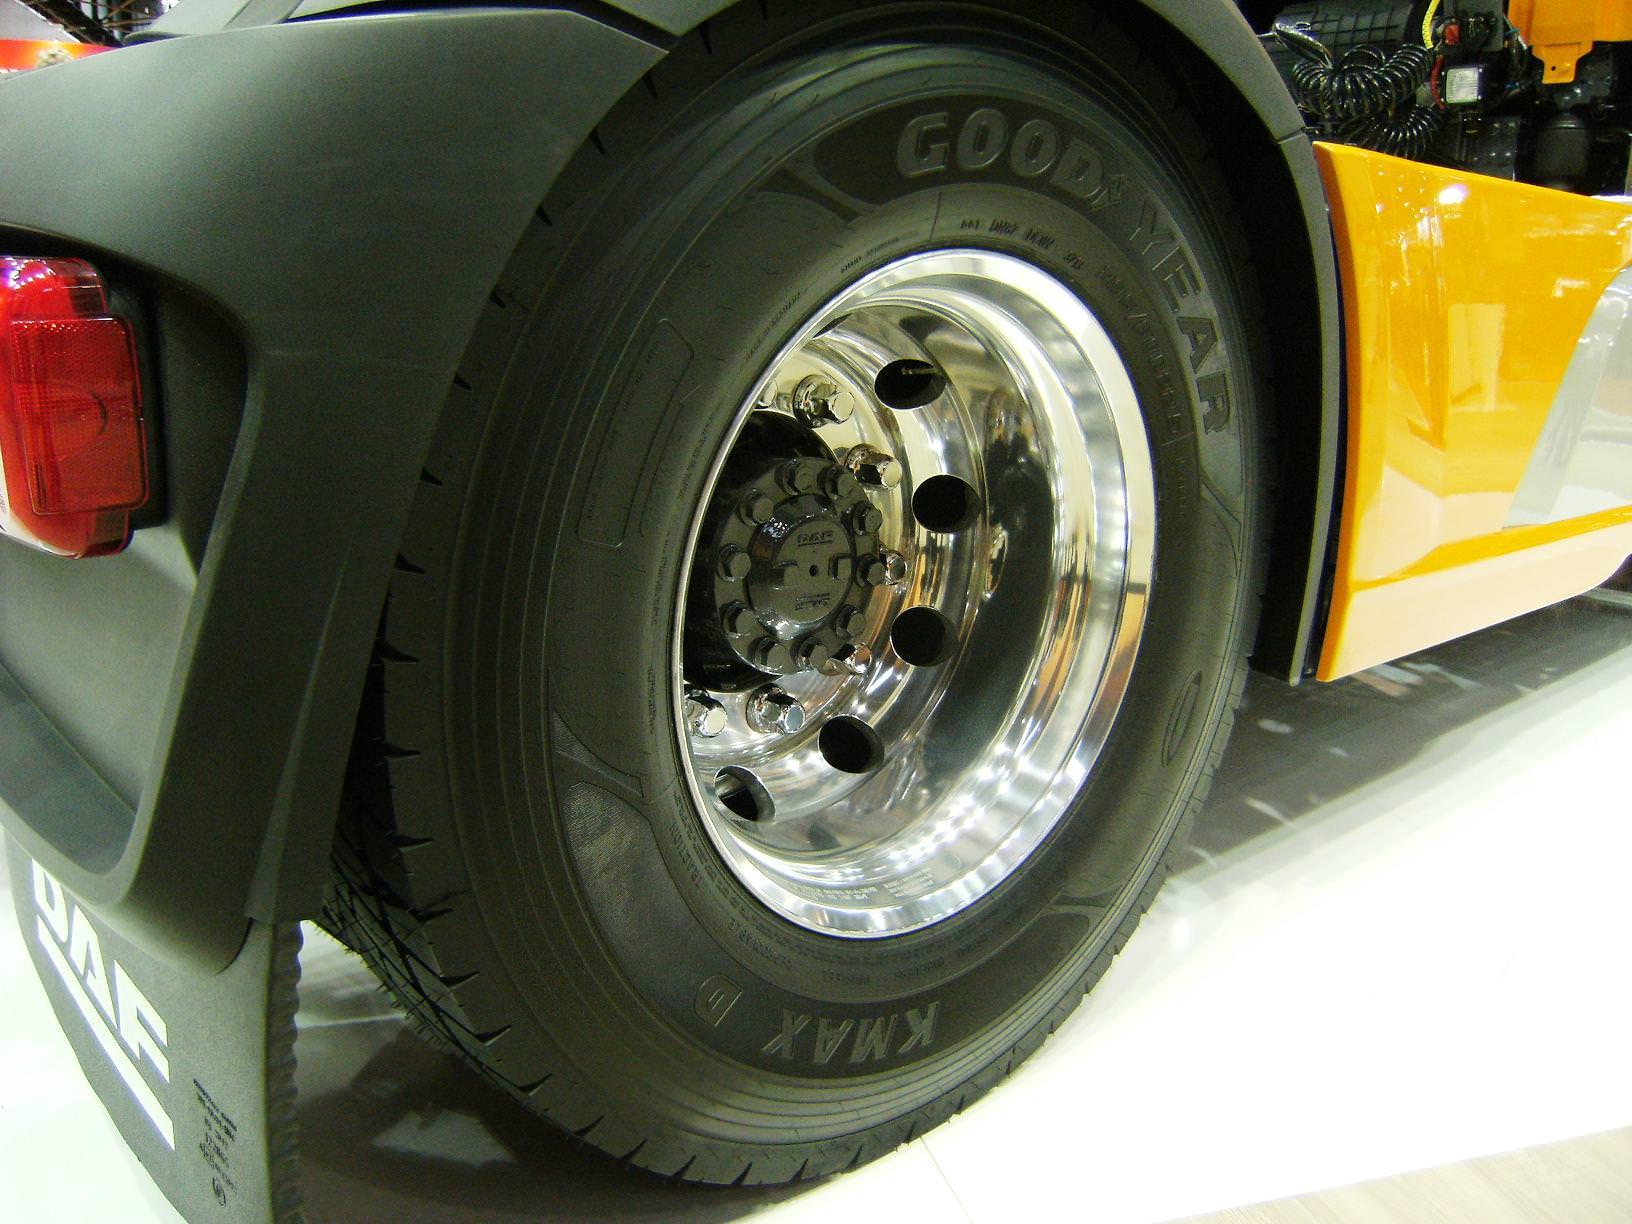 DAF, primul producator ce vine echipat cu noile anvelope KMAX si FuelMAX de la Goodyear